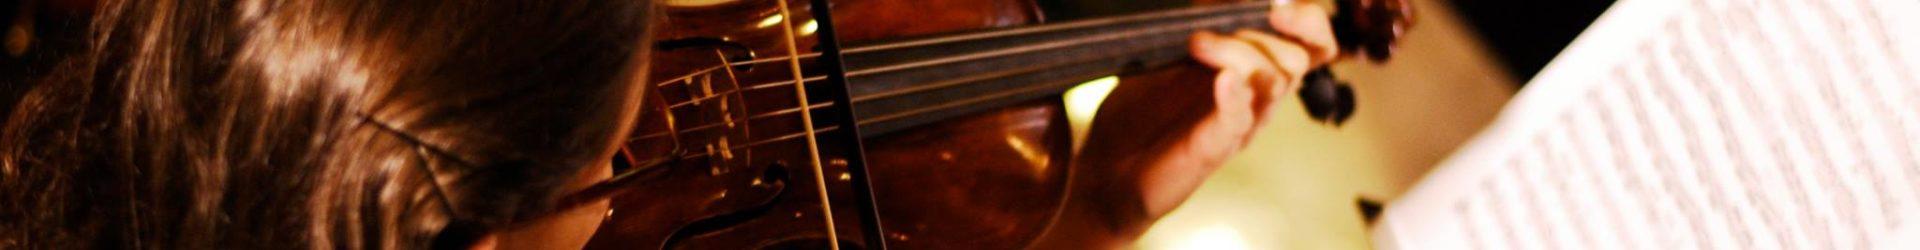 Cornu Copiae: Expectatio – Koncert wielkopostny